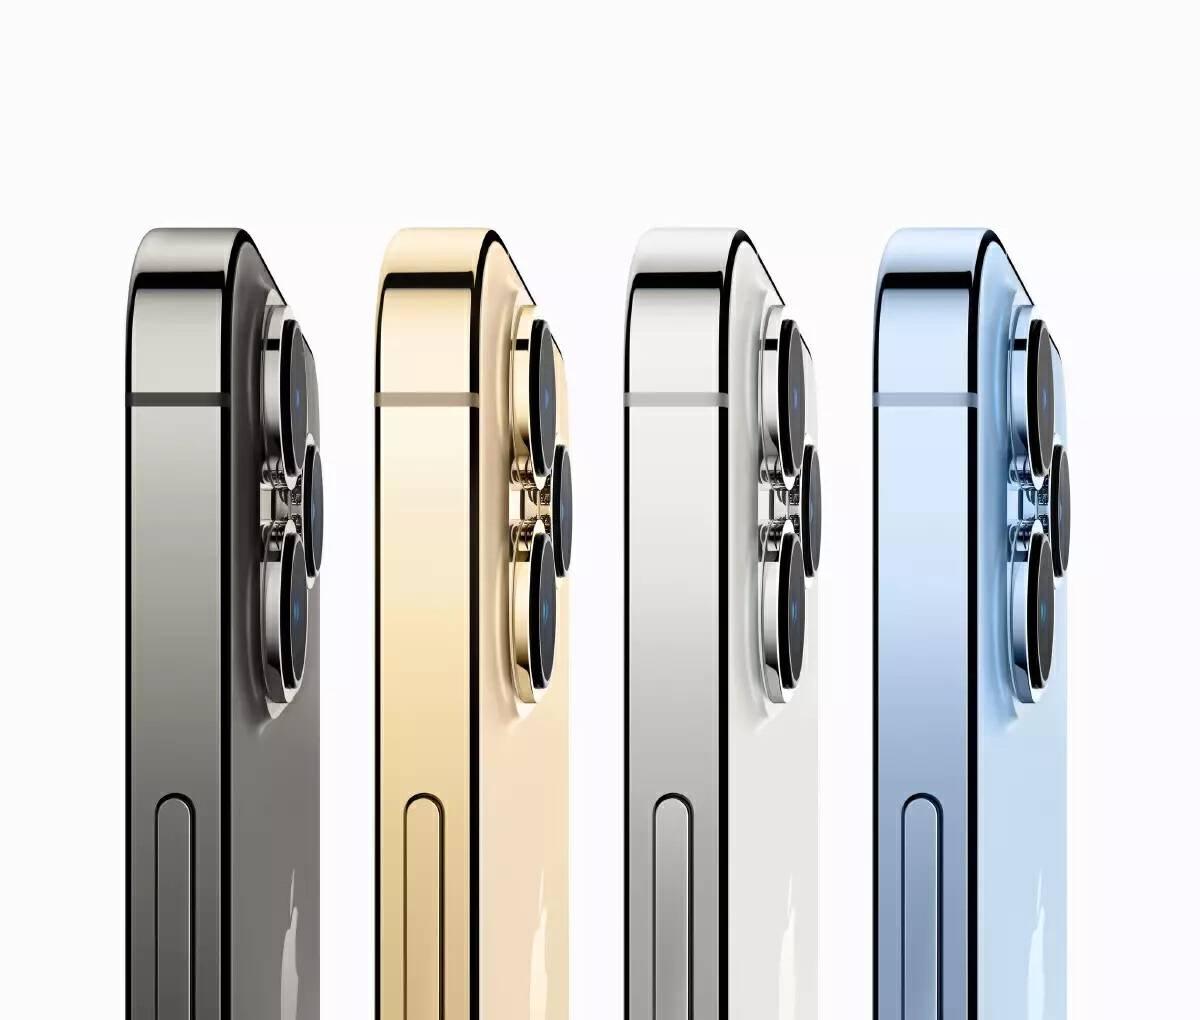 iPhone 13 Pro กับ iPhone 13 Pro Max รุ่นไหน ความจุเท่าไหร่ เหมาะกับคุณ เช็คเลย